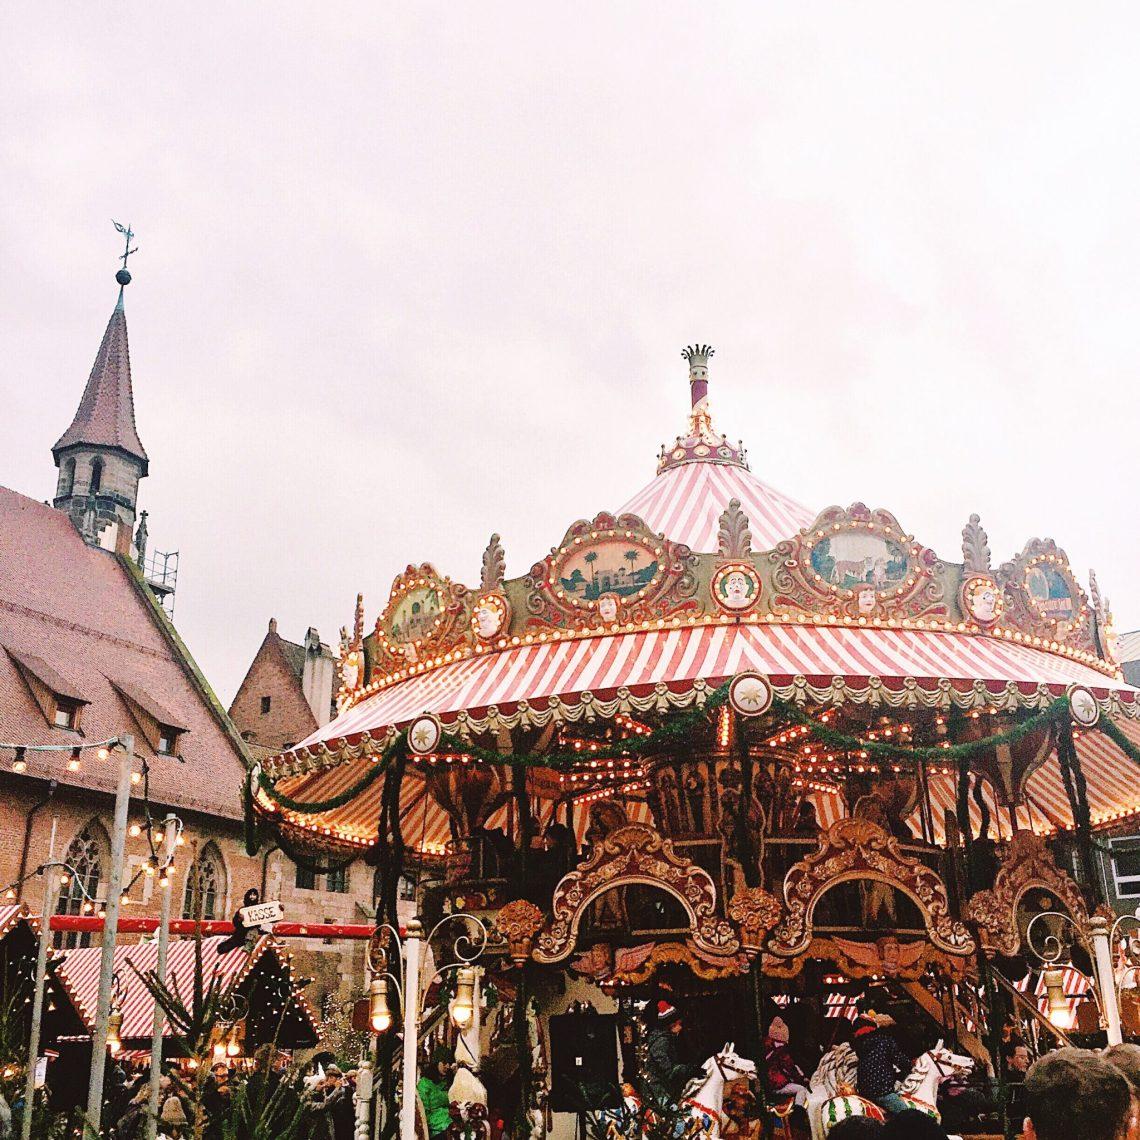 Nuremberg Christmas Market merry go round